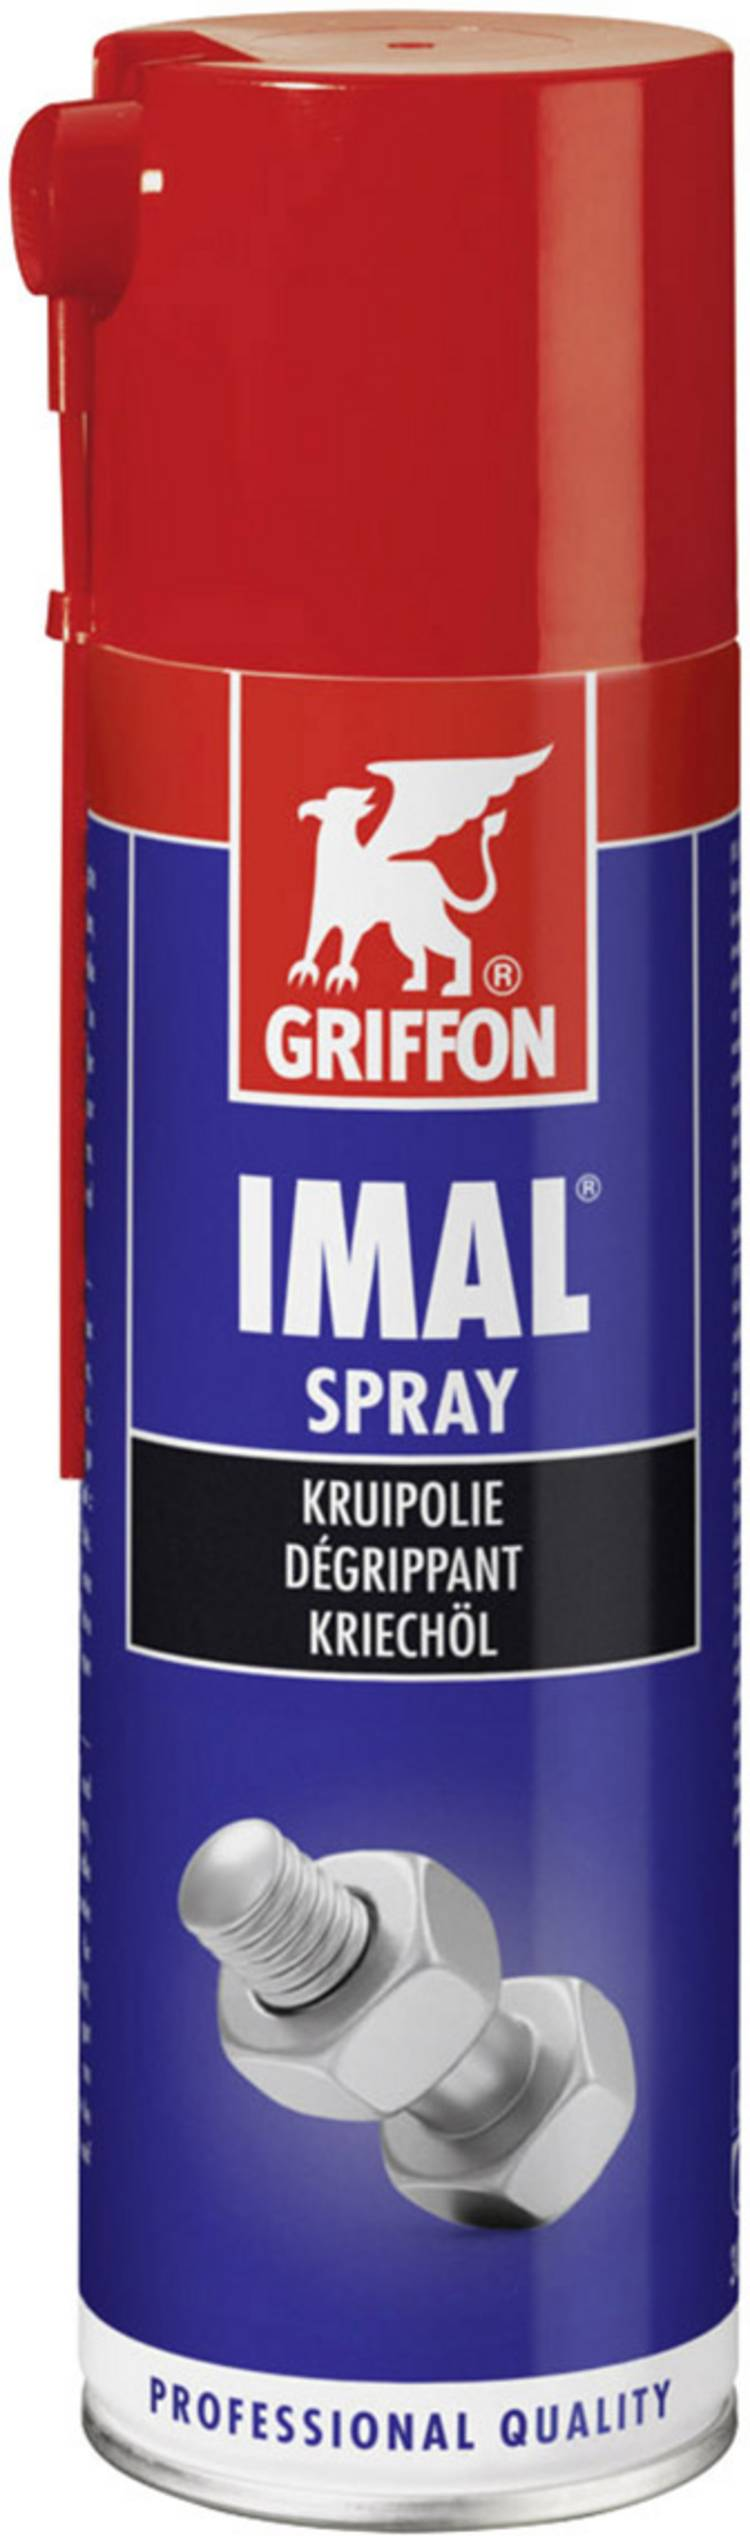 Image of Kruipolie 300 ml Griffon IMAL SPRAY 91402